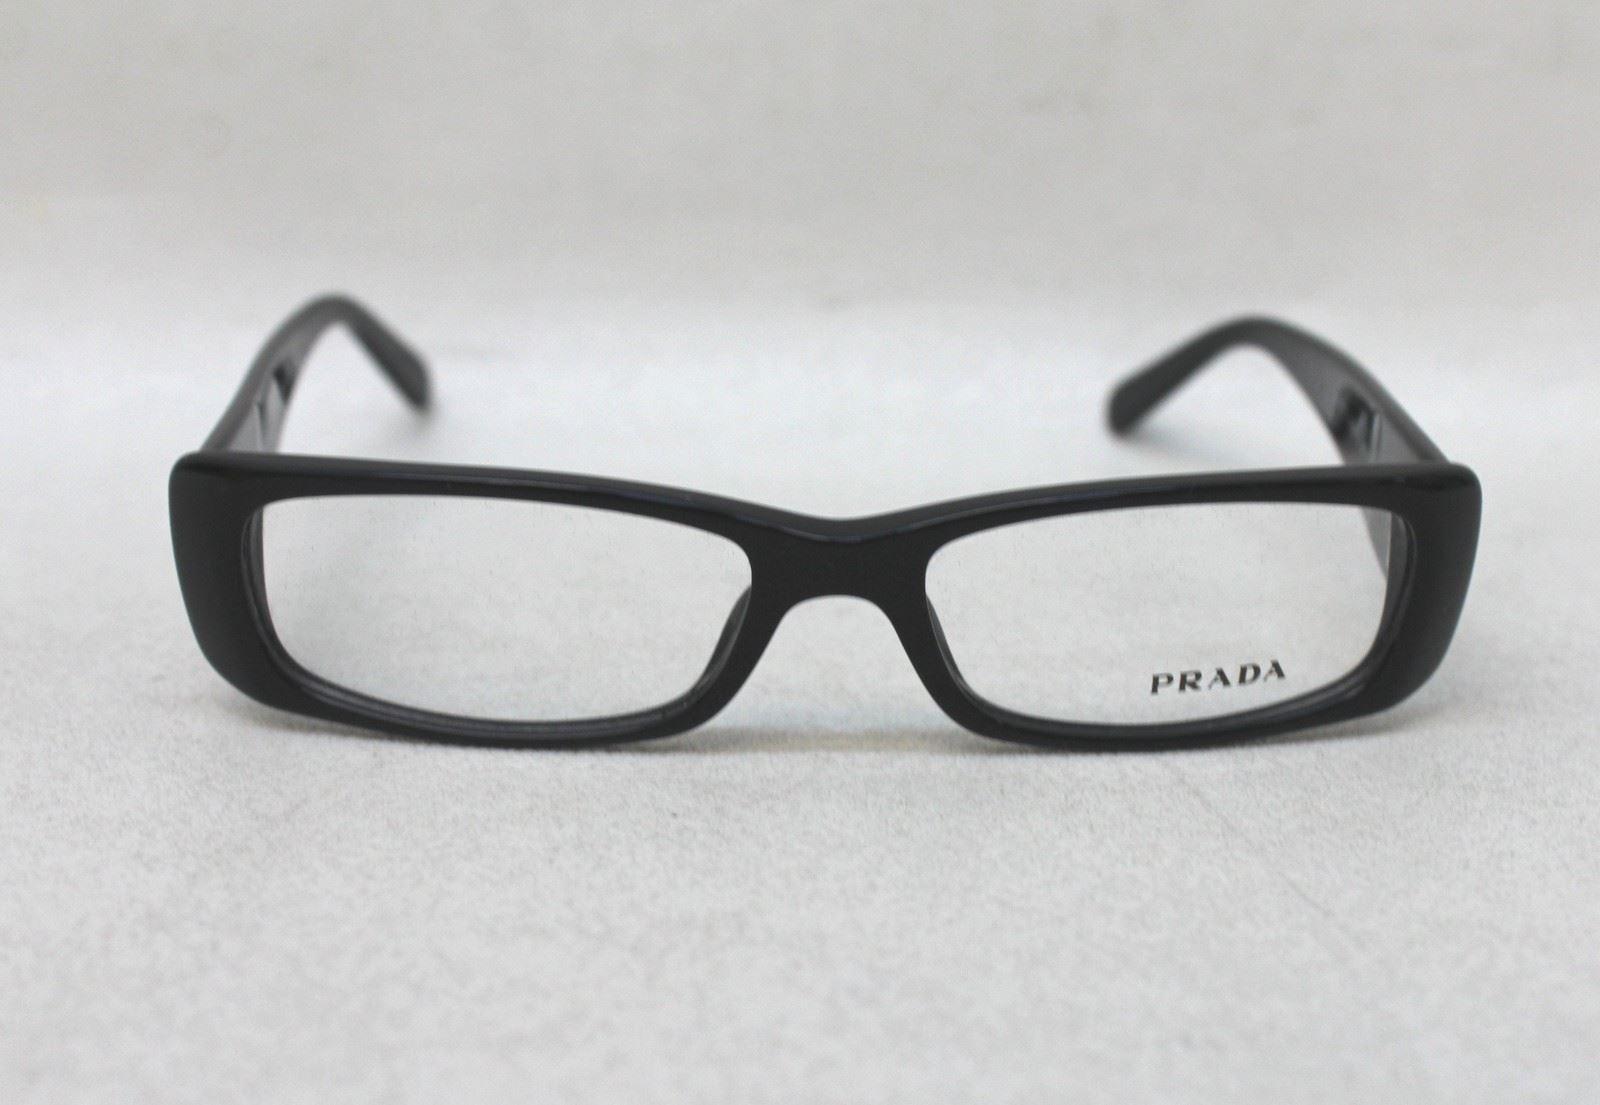 Glasses Narrow Frame : NEW PRADA Ladies Black Narrow Rectangular Frame VPR 17L ...